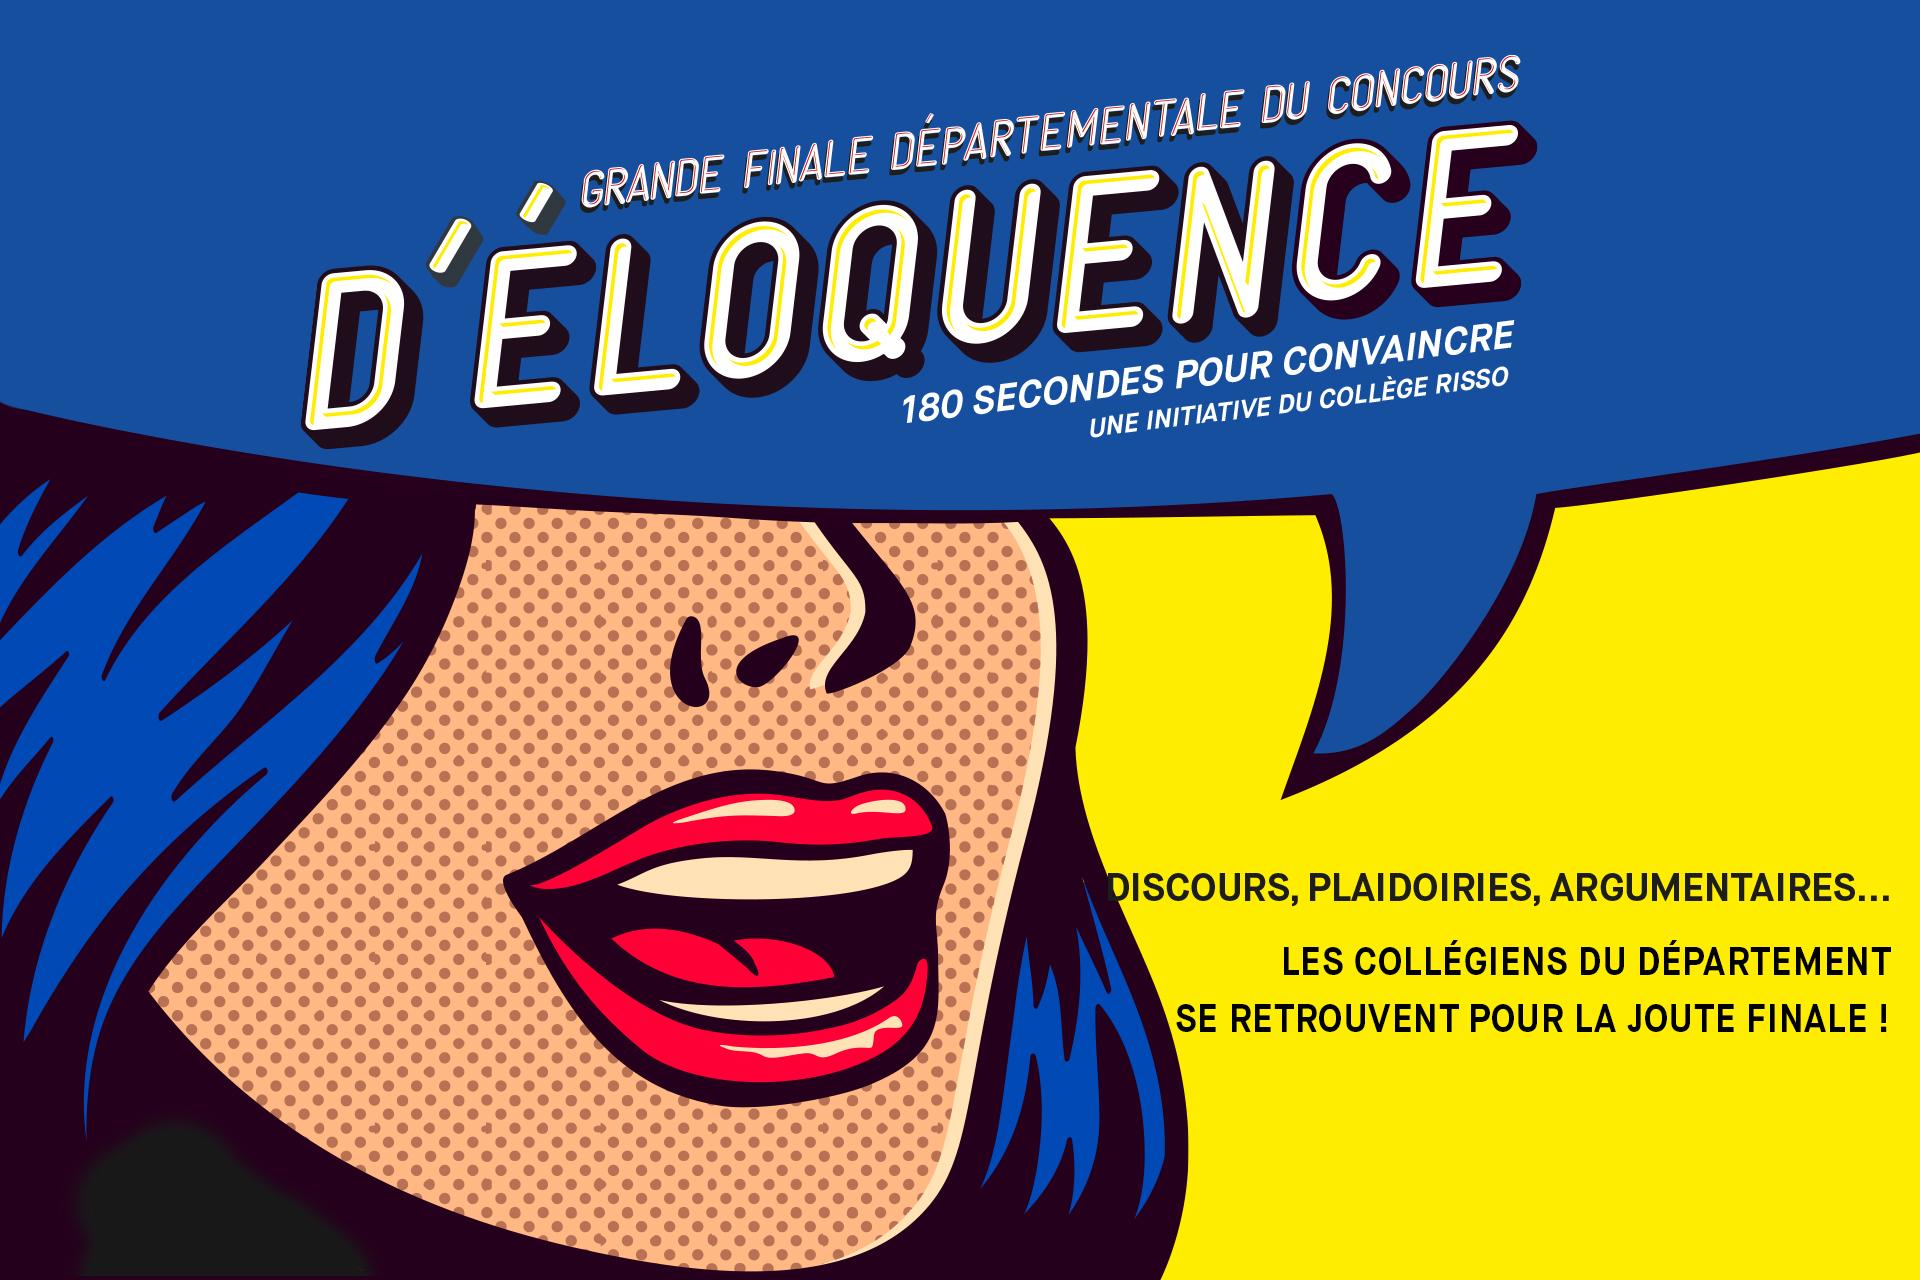 dept06-actu-concours-eloquence2021.jpg